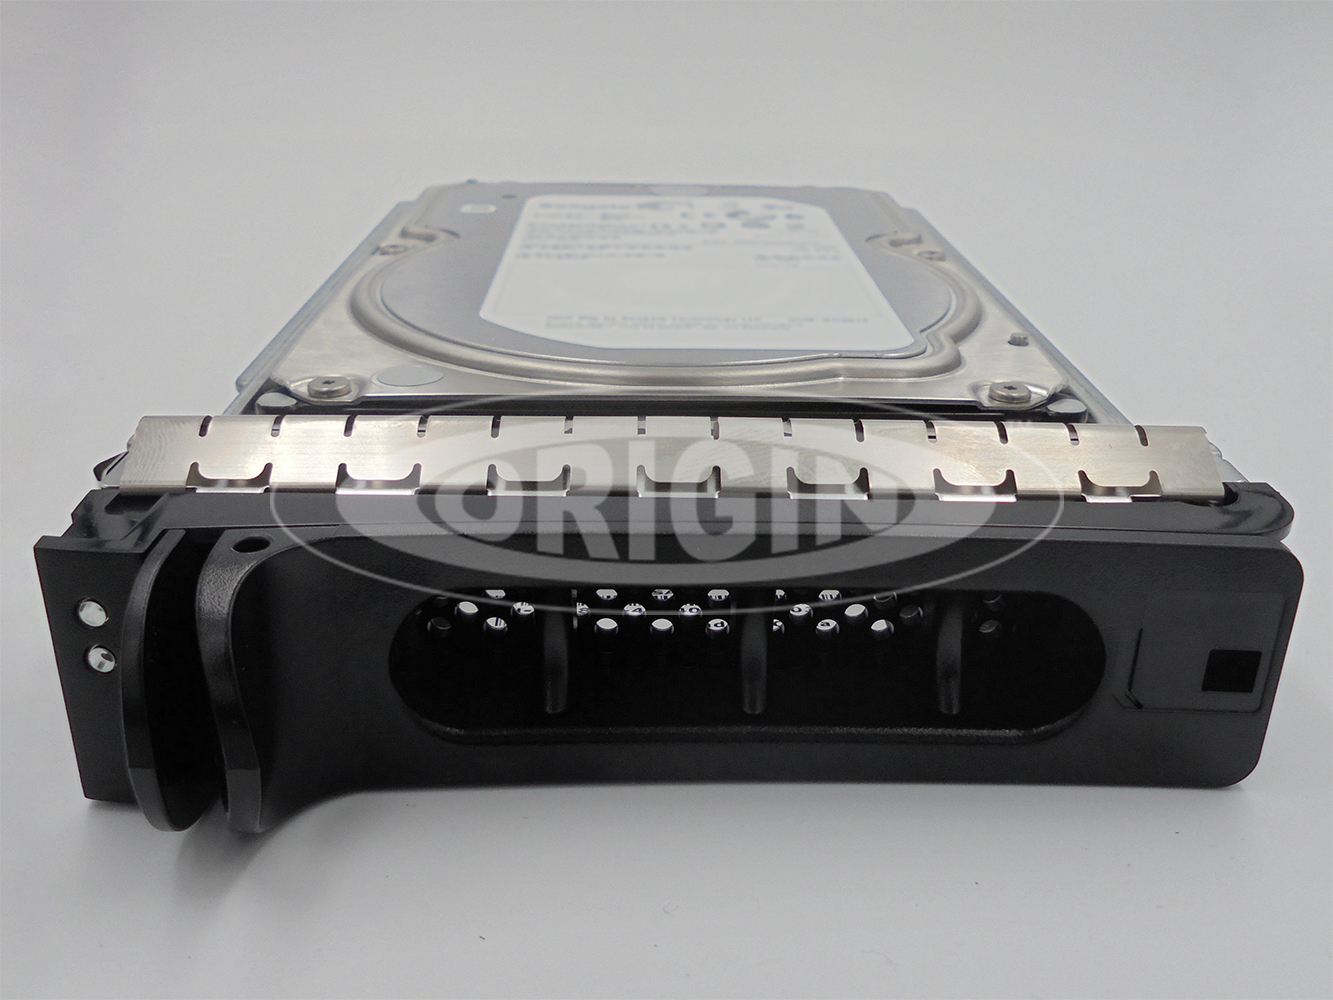 Origin Storage 1TB SATA 1000GB Serial ATA III internal hard drive